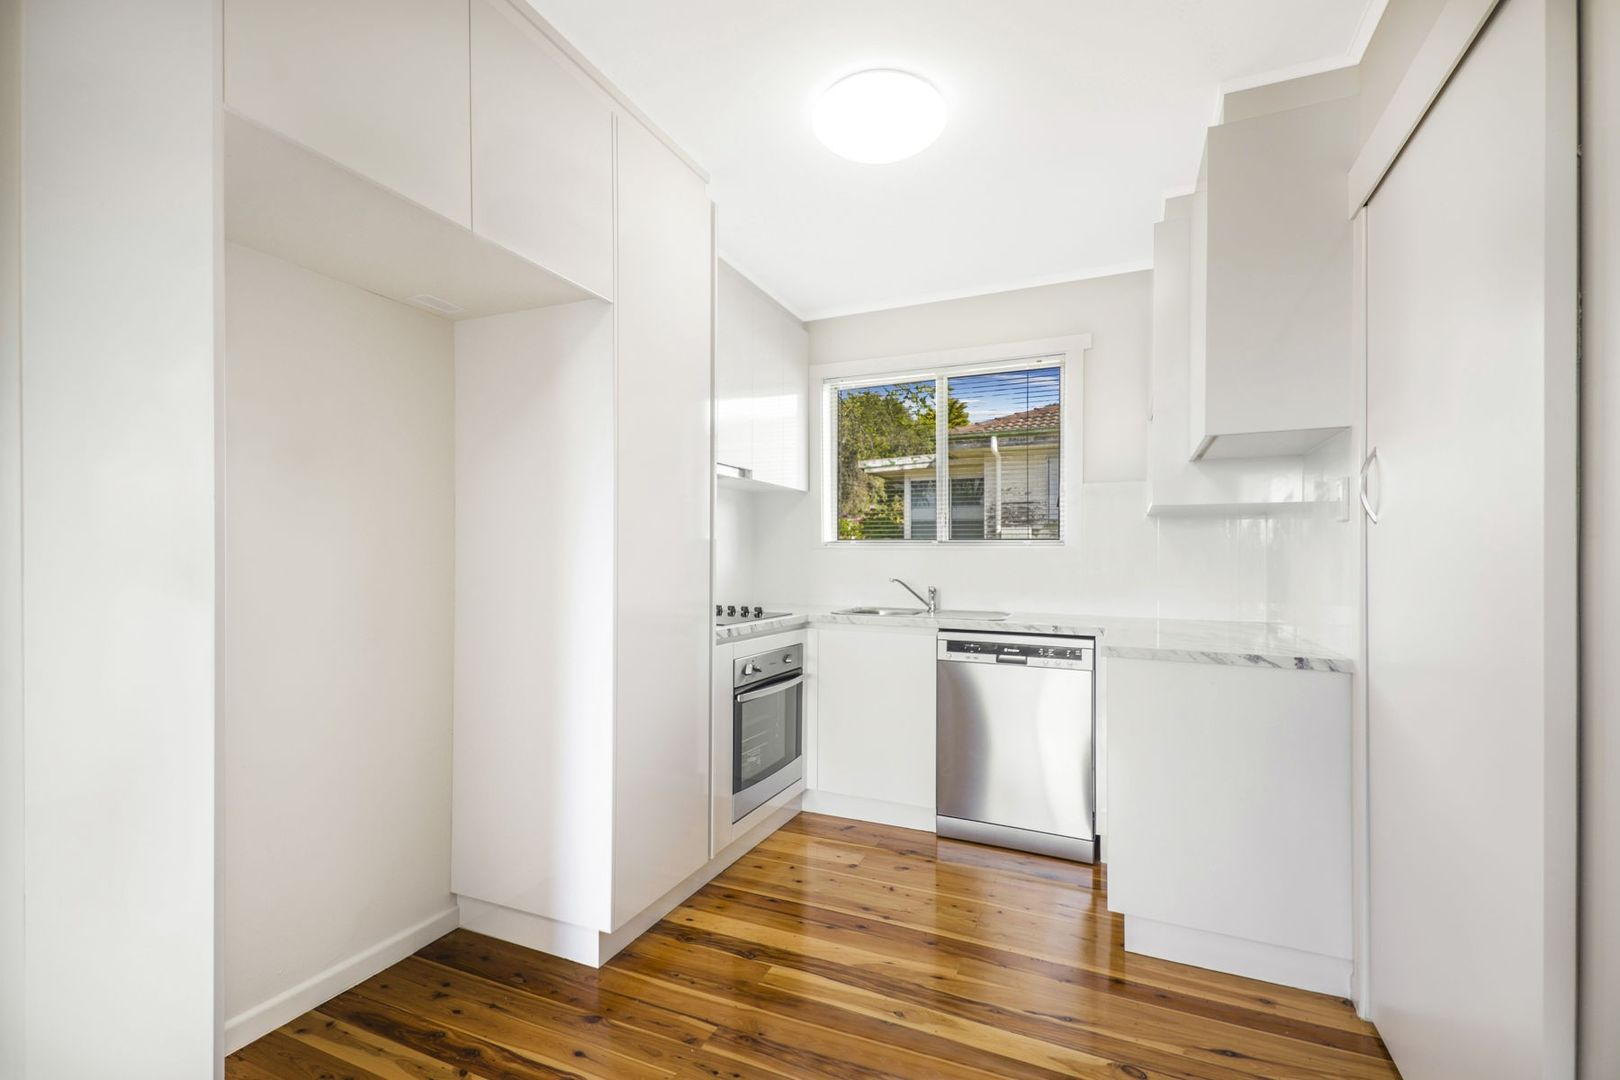 1/23 Leichhardt Street, Centenary Heights QLD 4350, Image 2